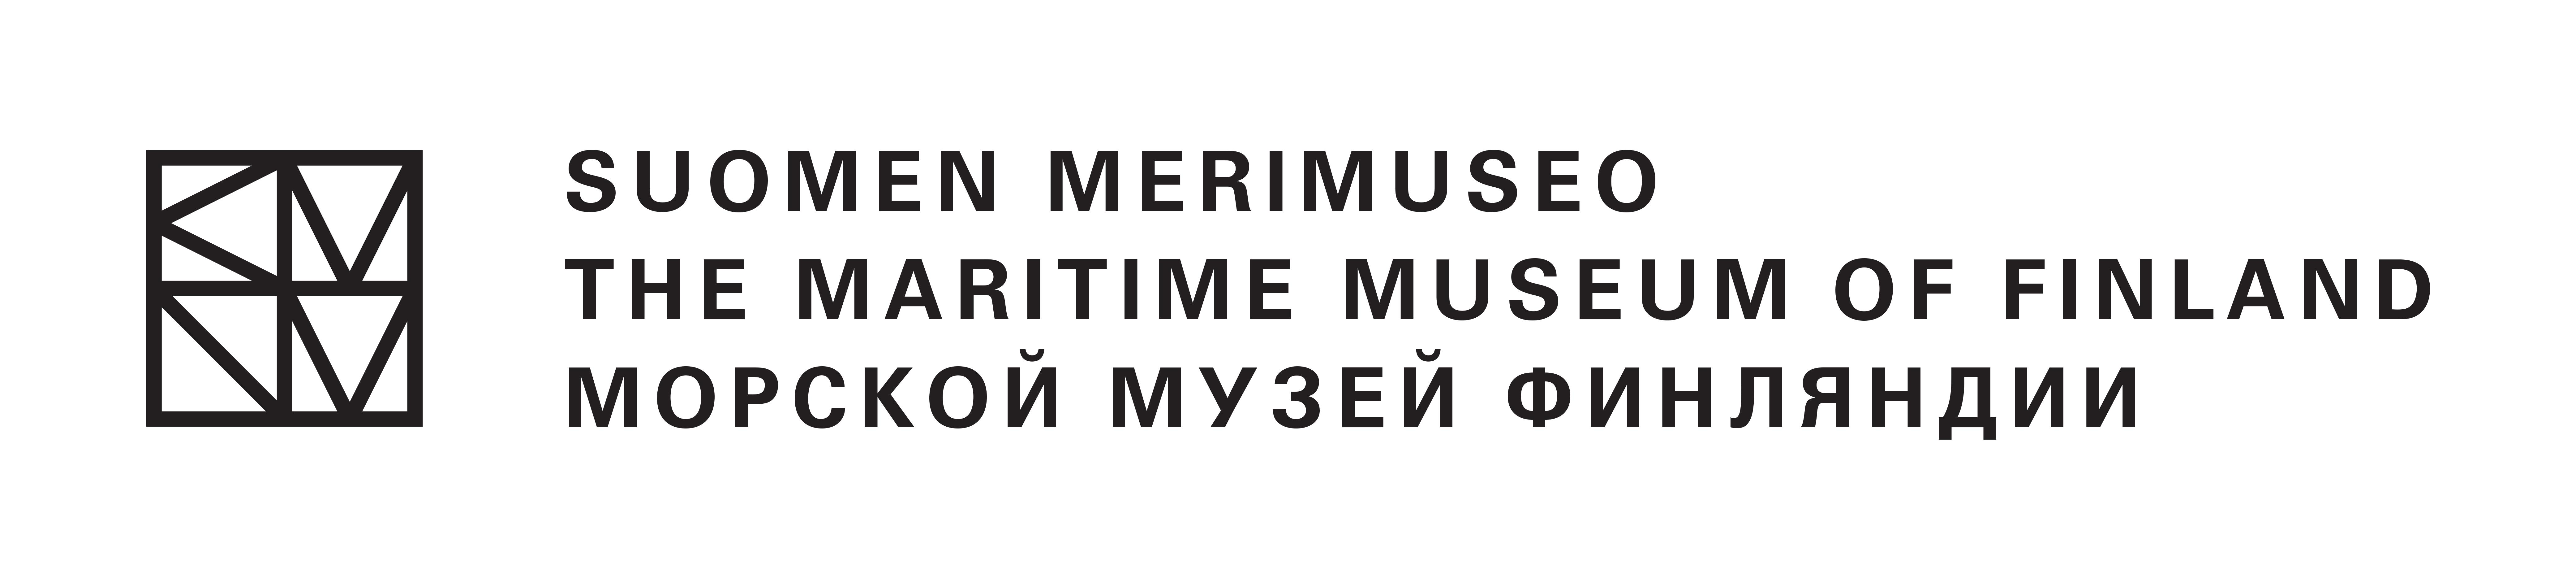 Suomen merimuseo. Logo.